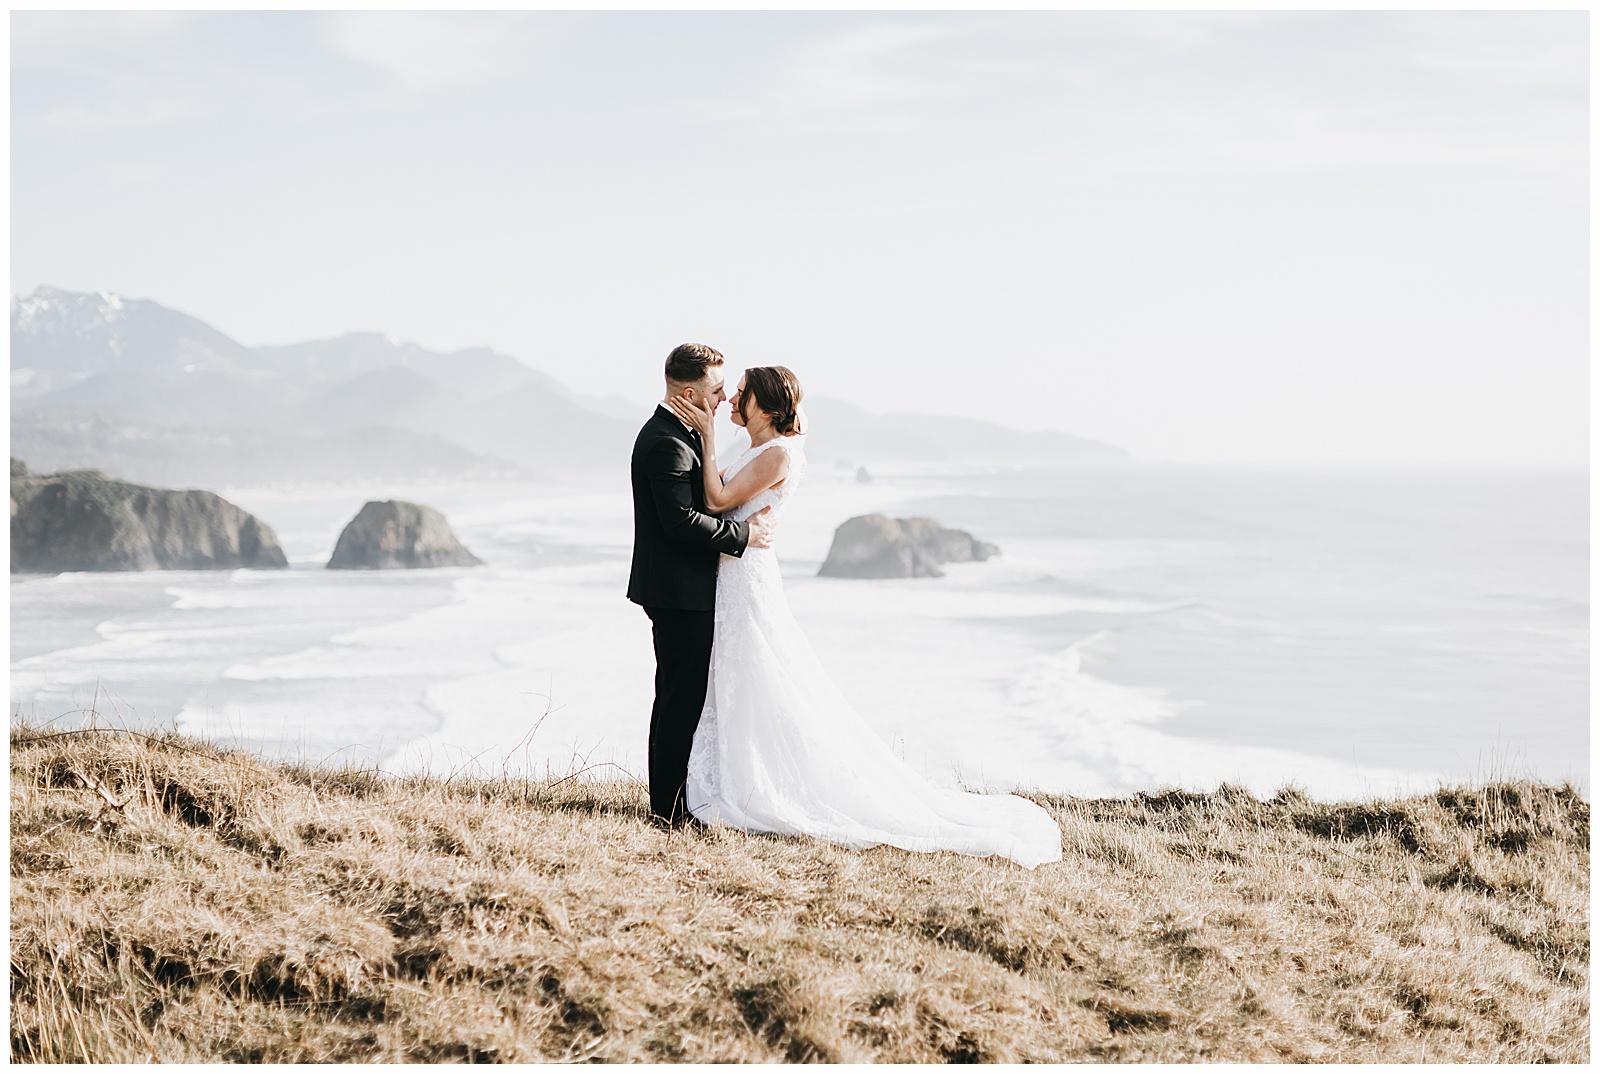 Ecola State Park Elopement Oregon Wedding Photographer Annie Zav Photography_0500.jpg